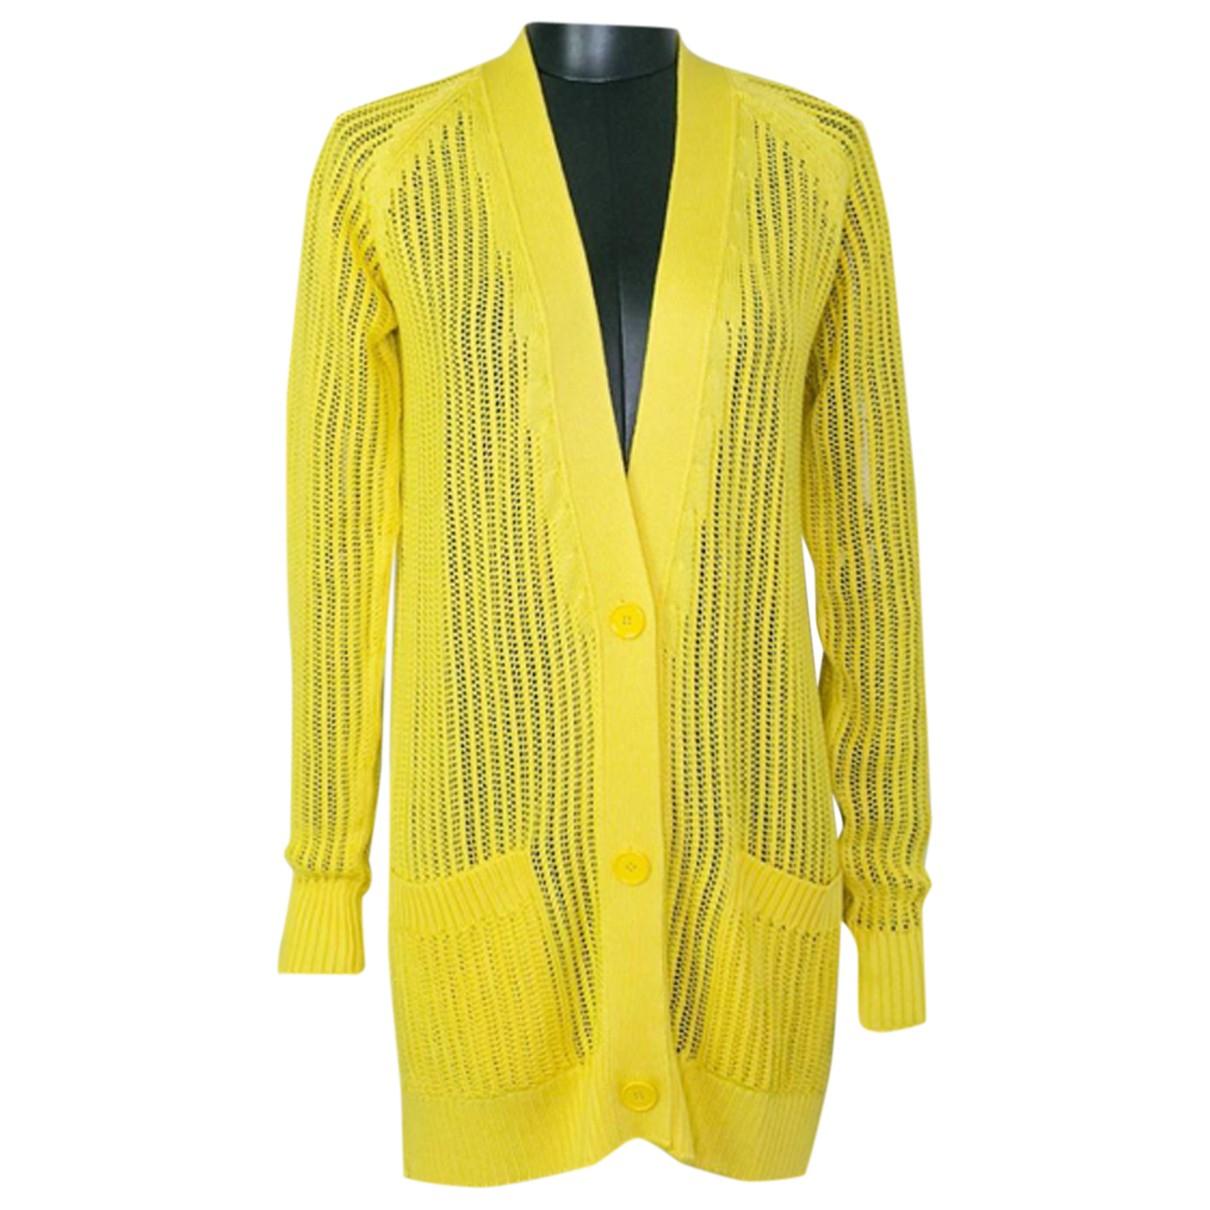 Hermès N Yellow Knitwear for Women 36 FR